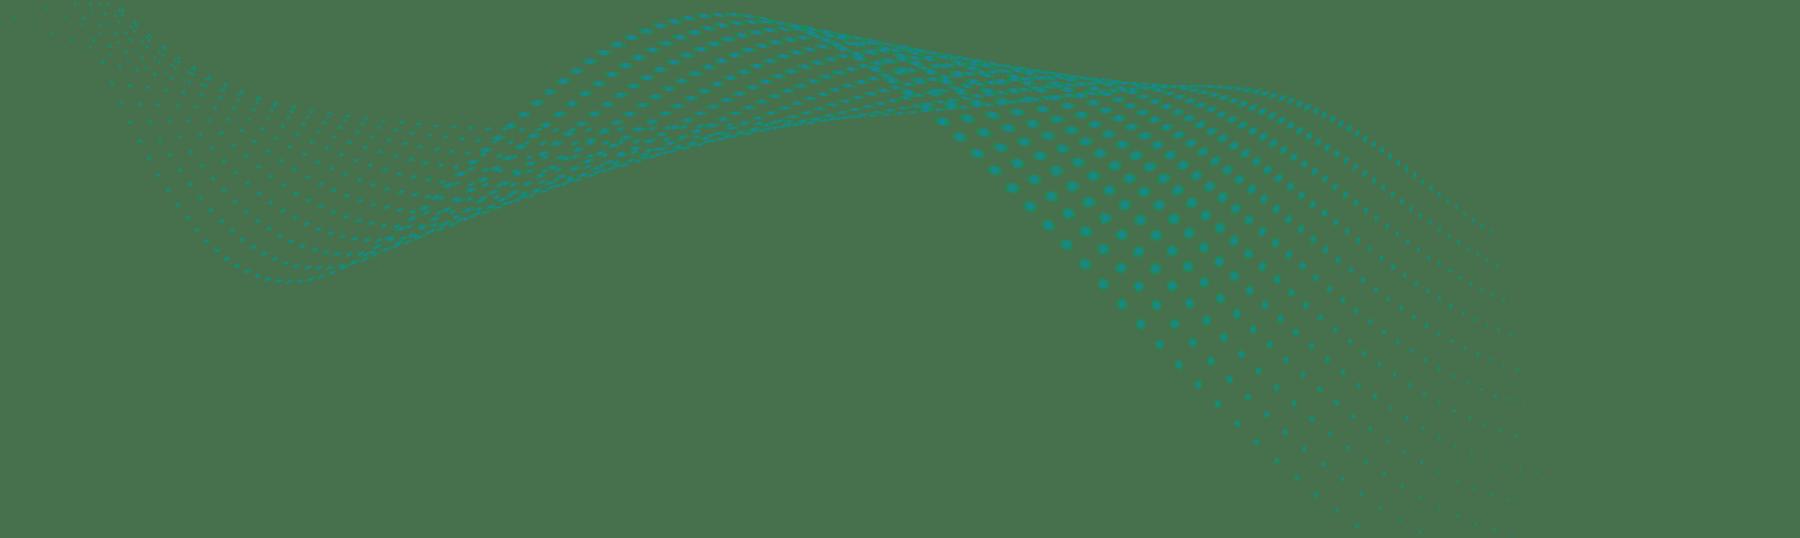 GreenDotWave-3